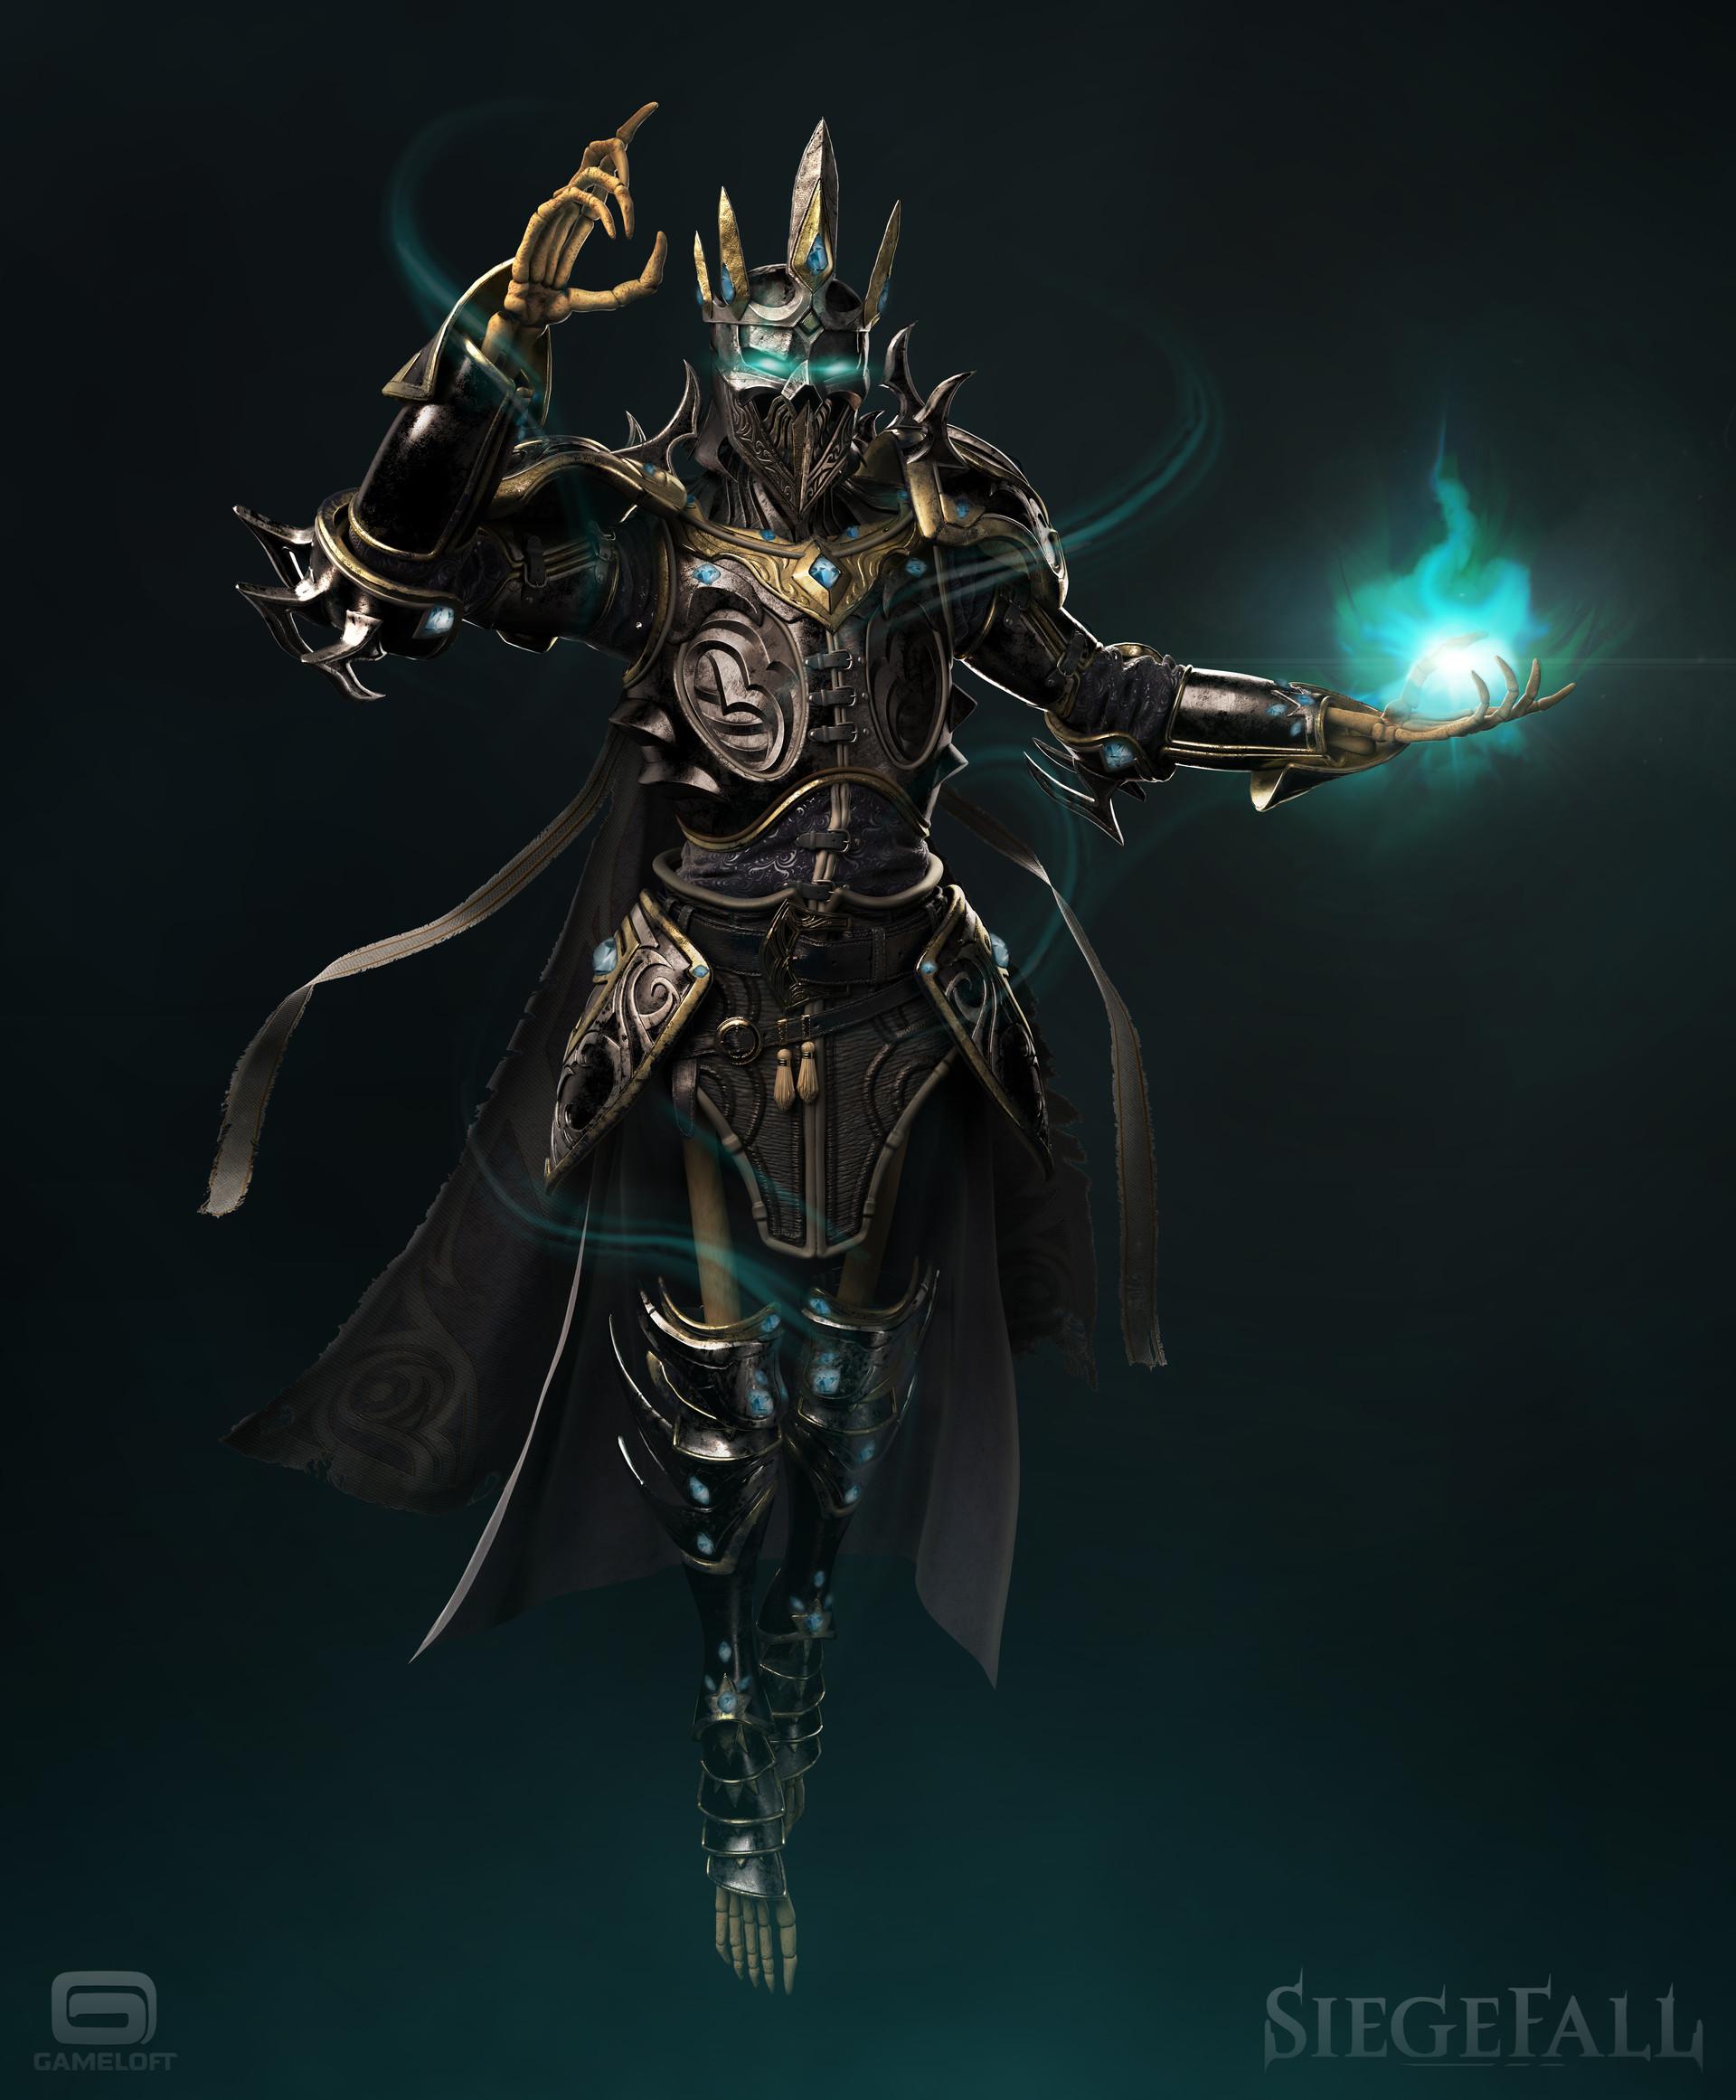 Siegefall - Skeleton Prince